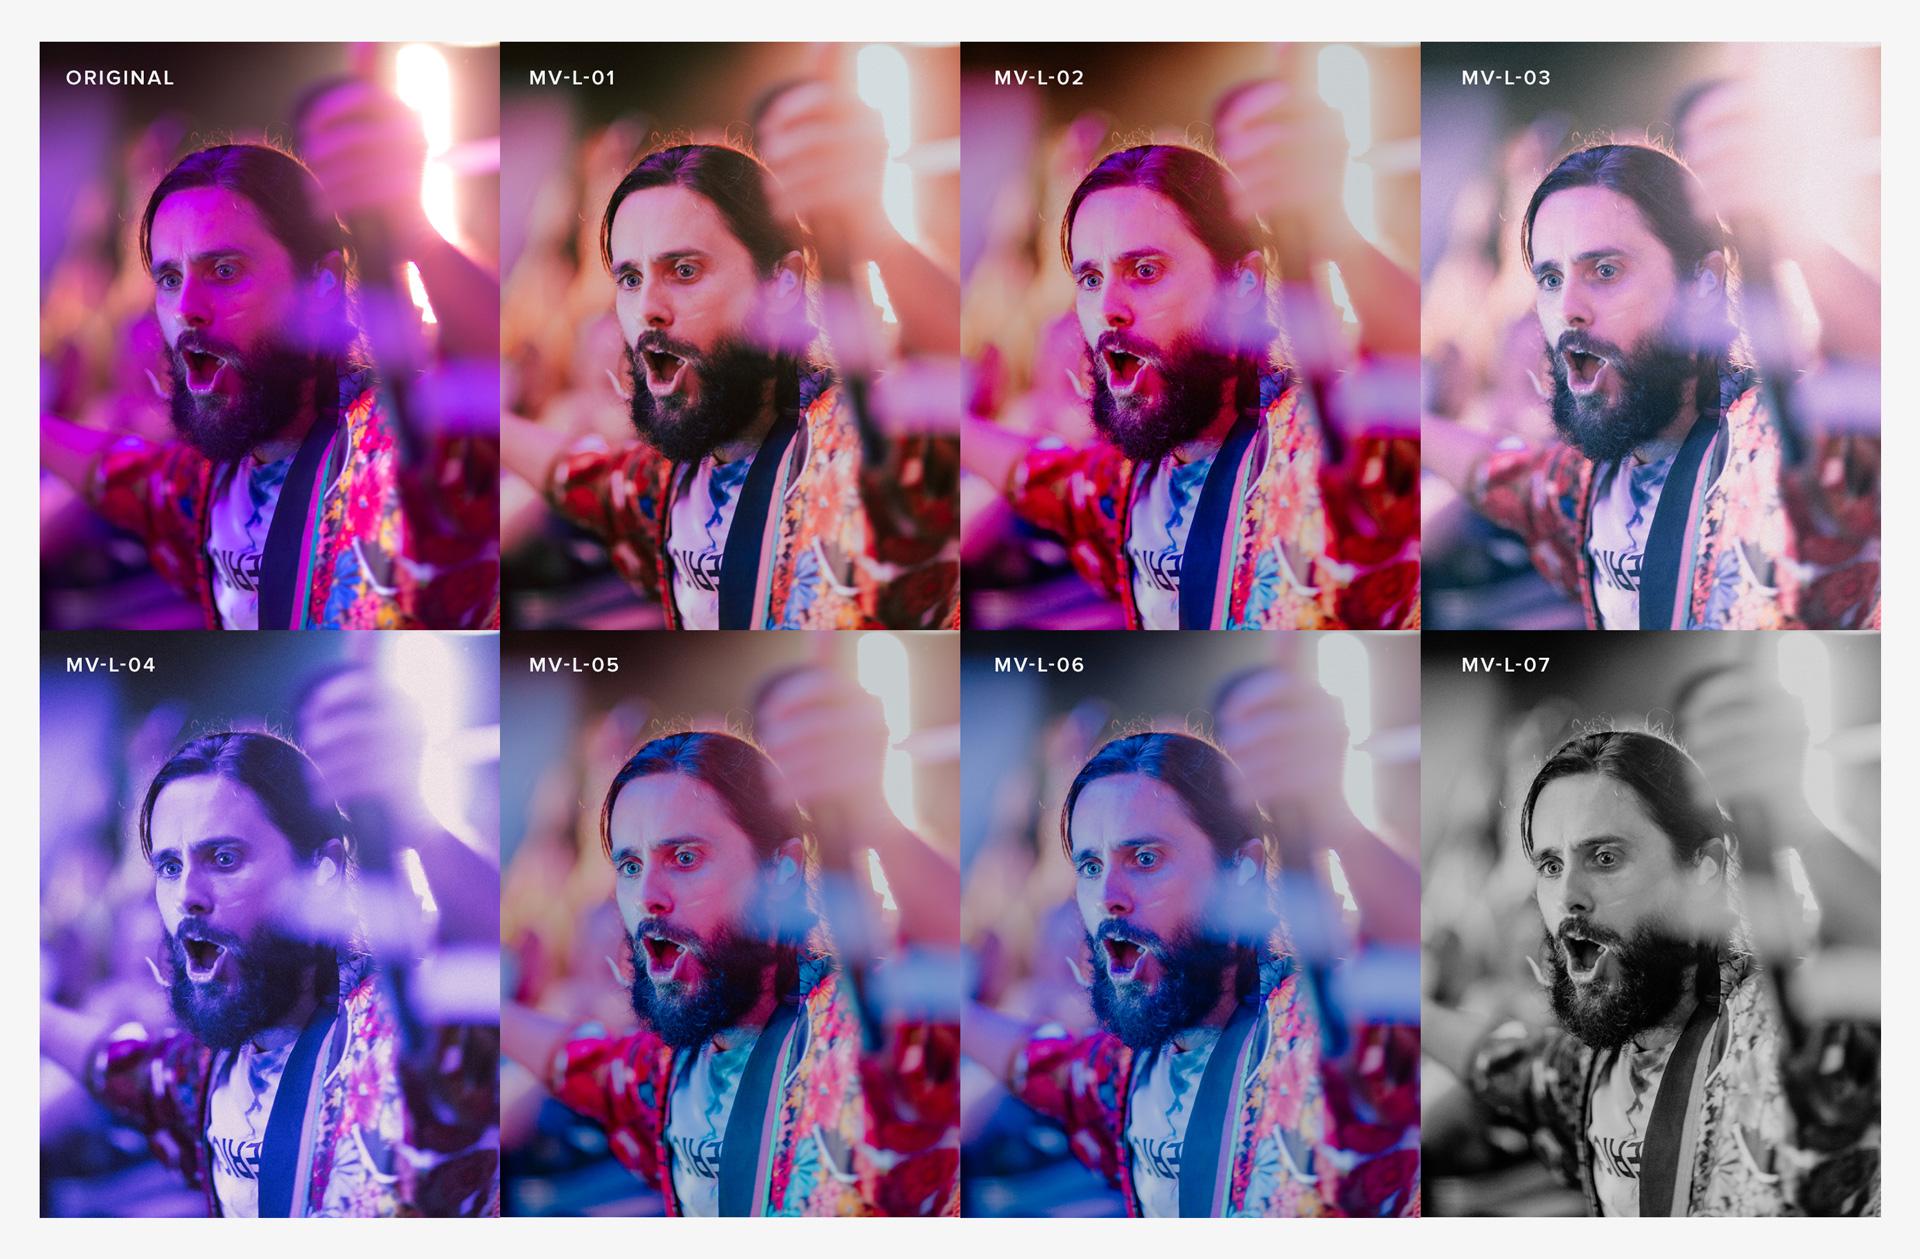 Adobe Lightroom Concert Photography Presets — Matty Vogel | Before & Afters